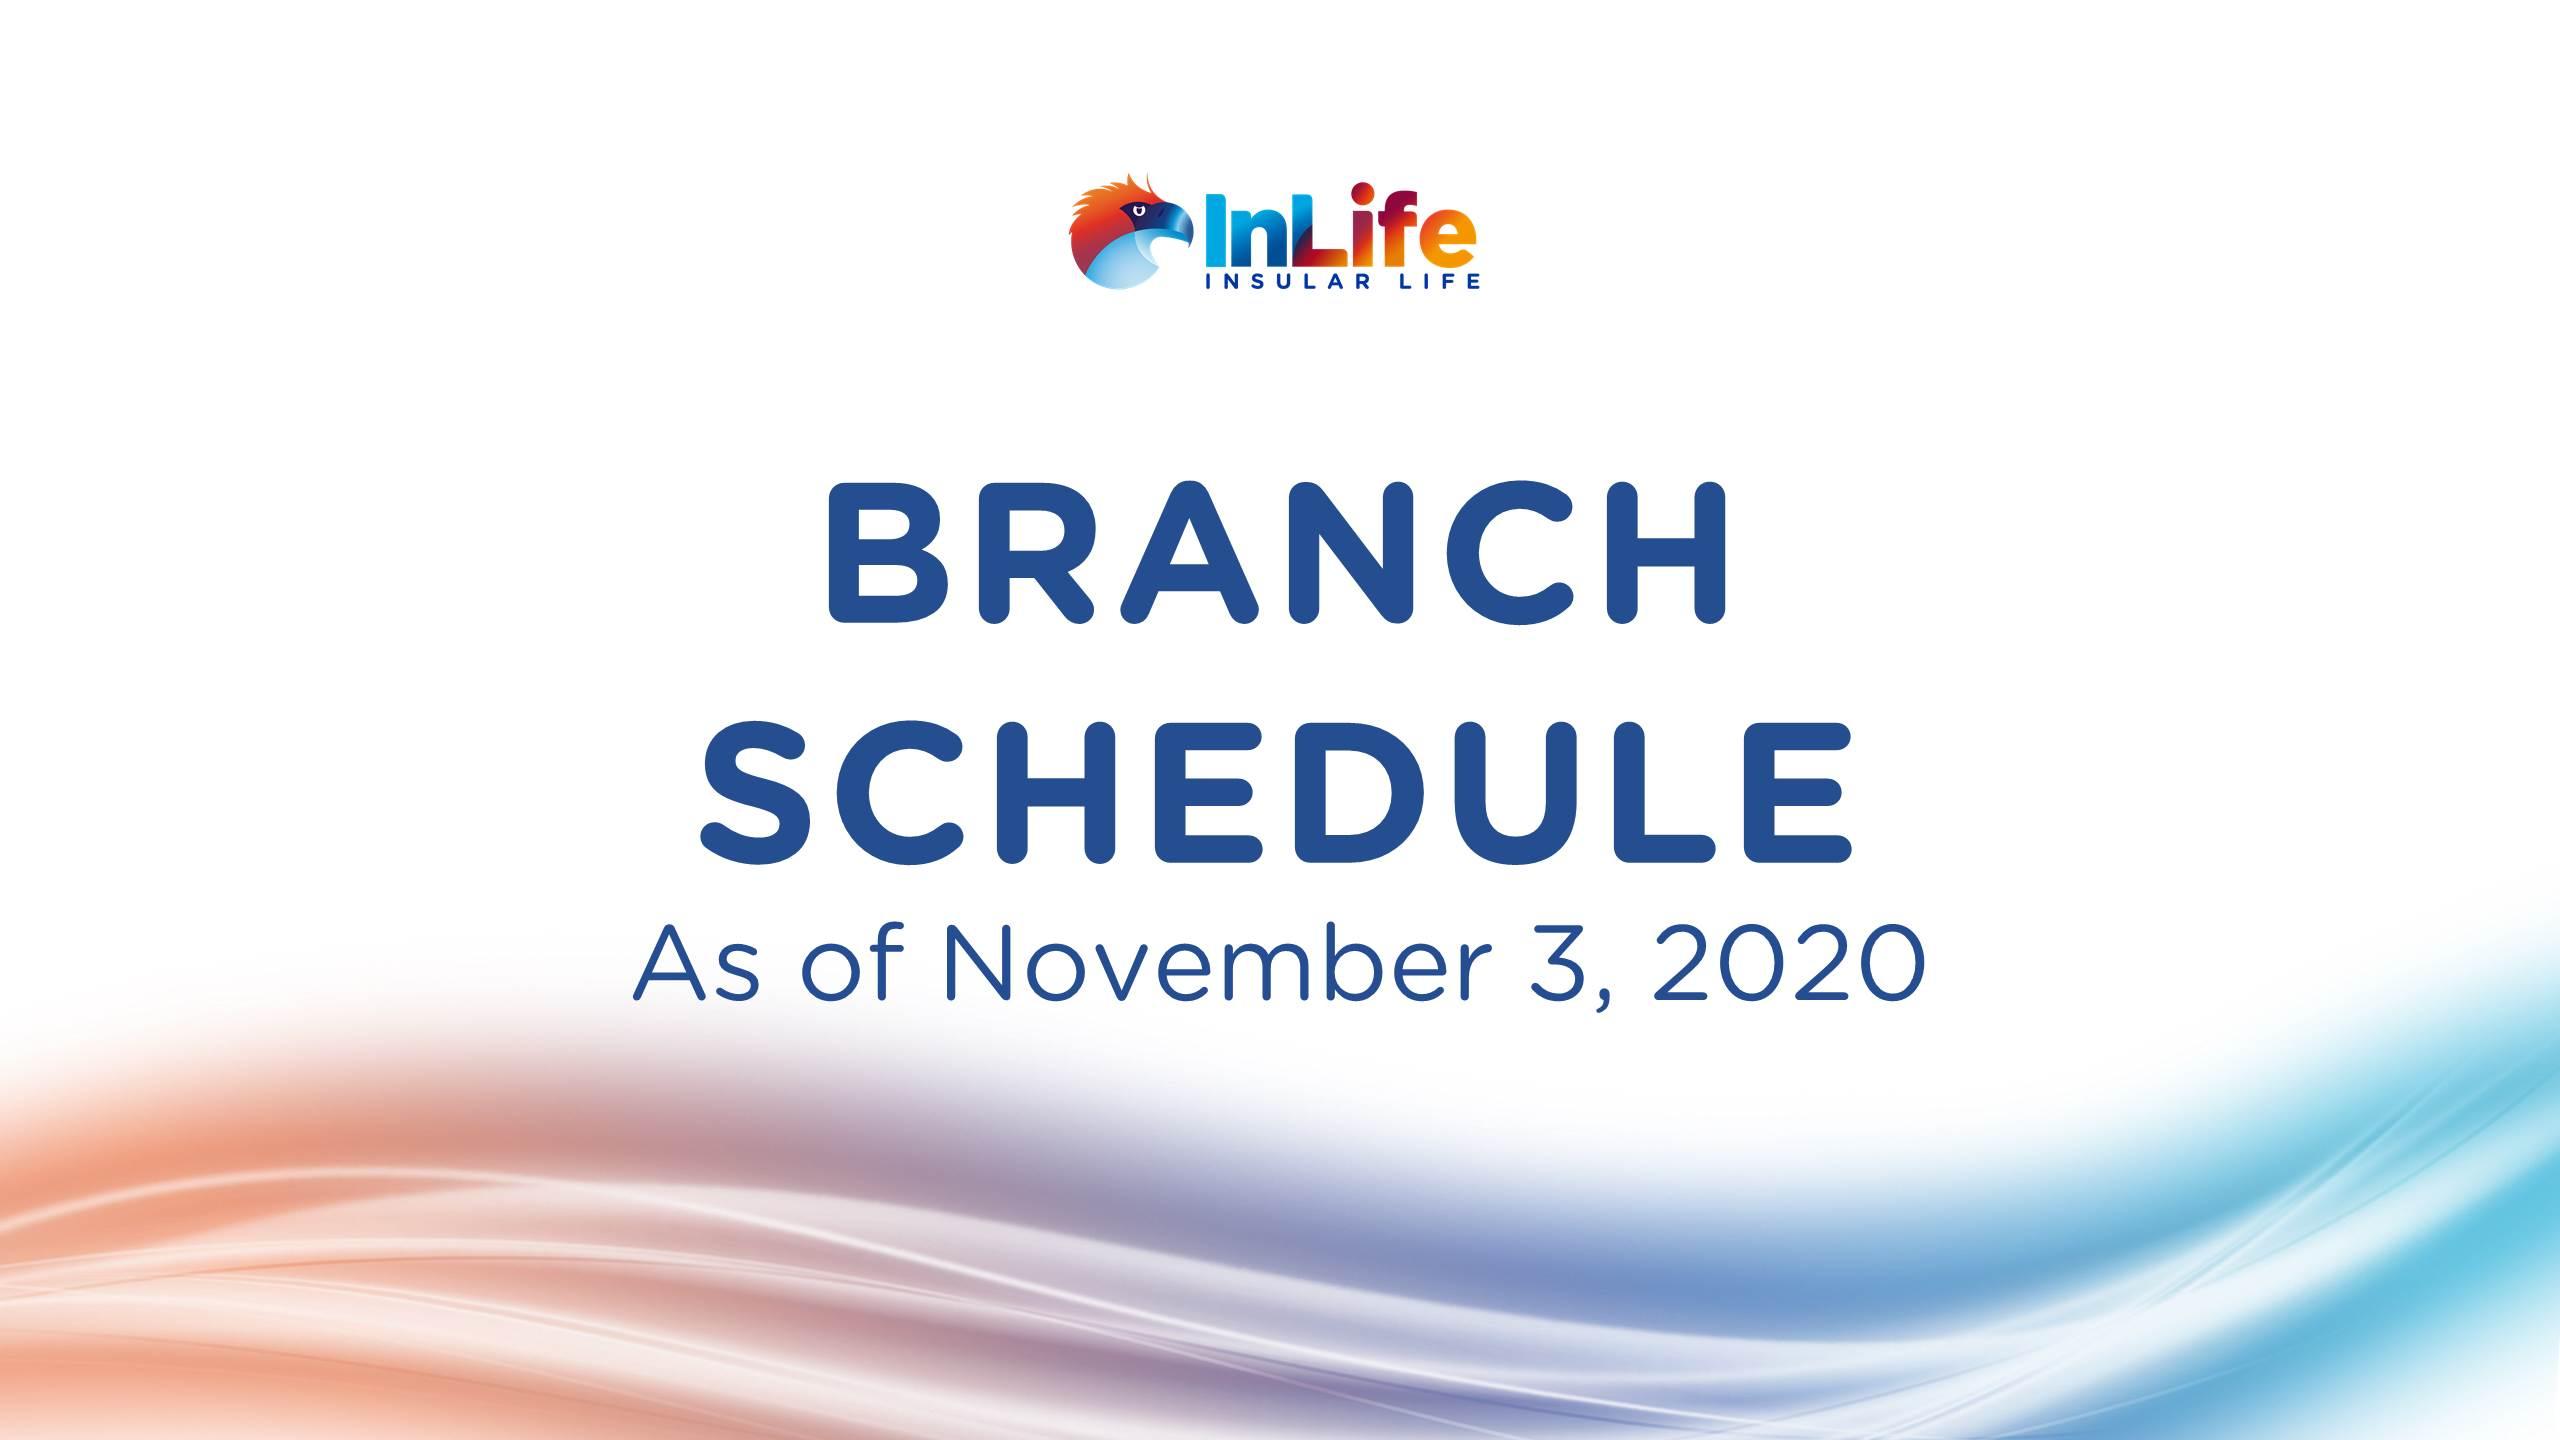 InLife Branch Schedule Starting November 3, 2020